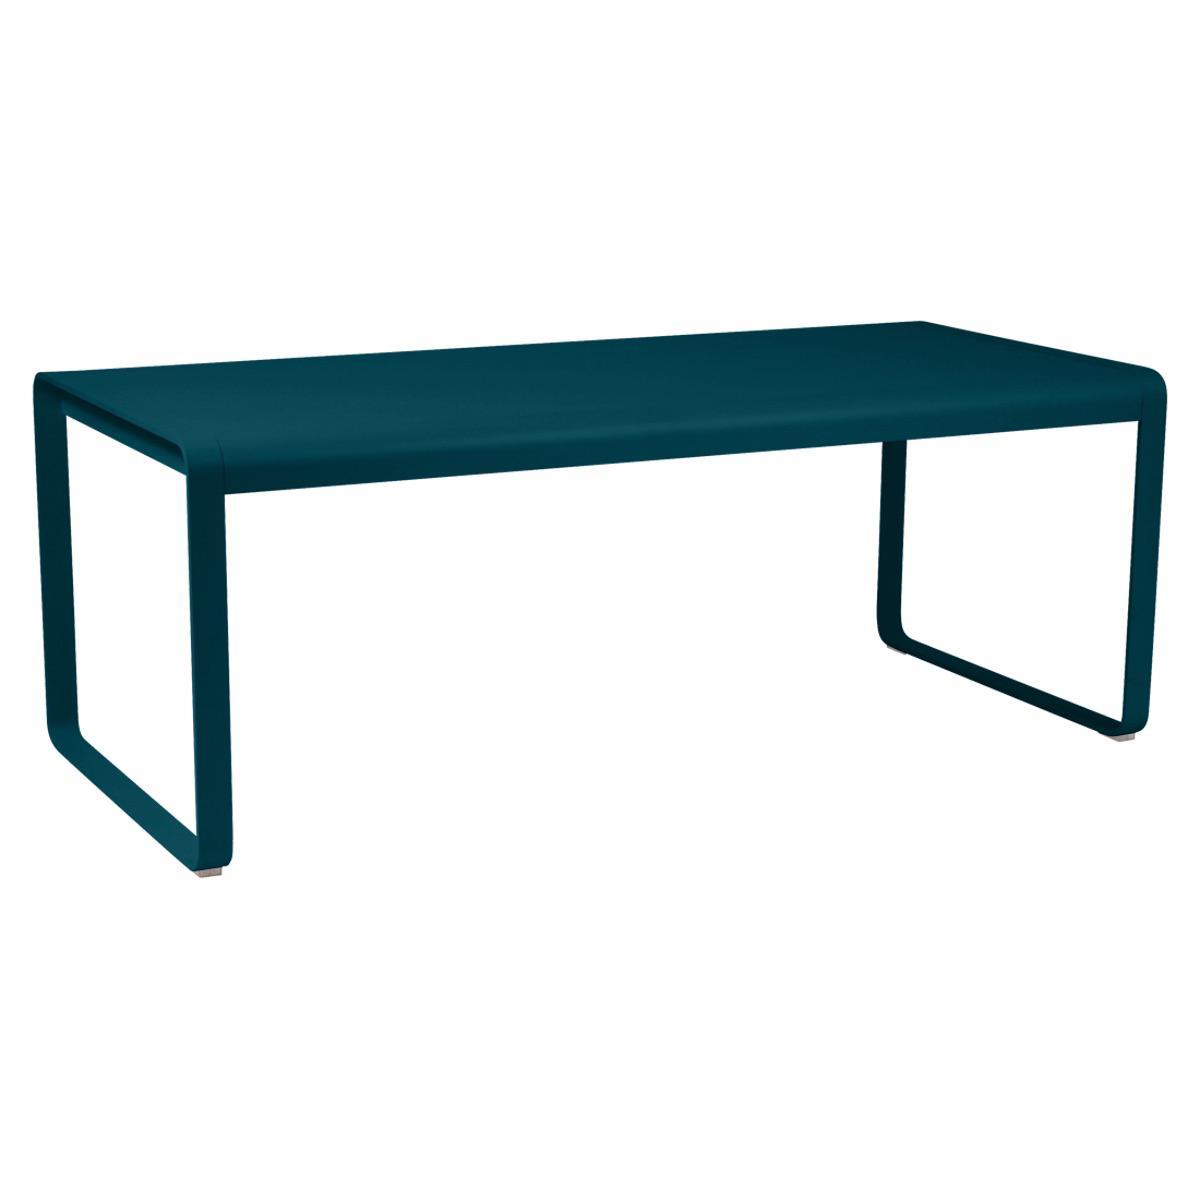 Table 90x196cm BELLEVIE PREMIUM Fermob bleu acapulco